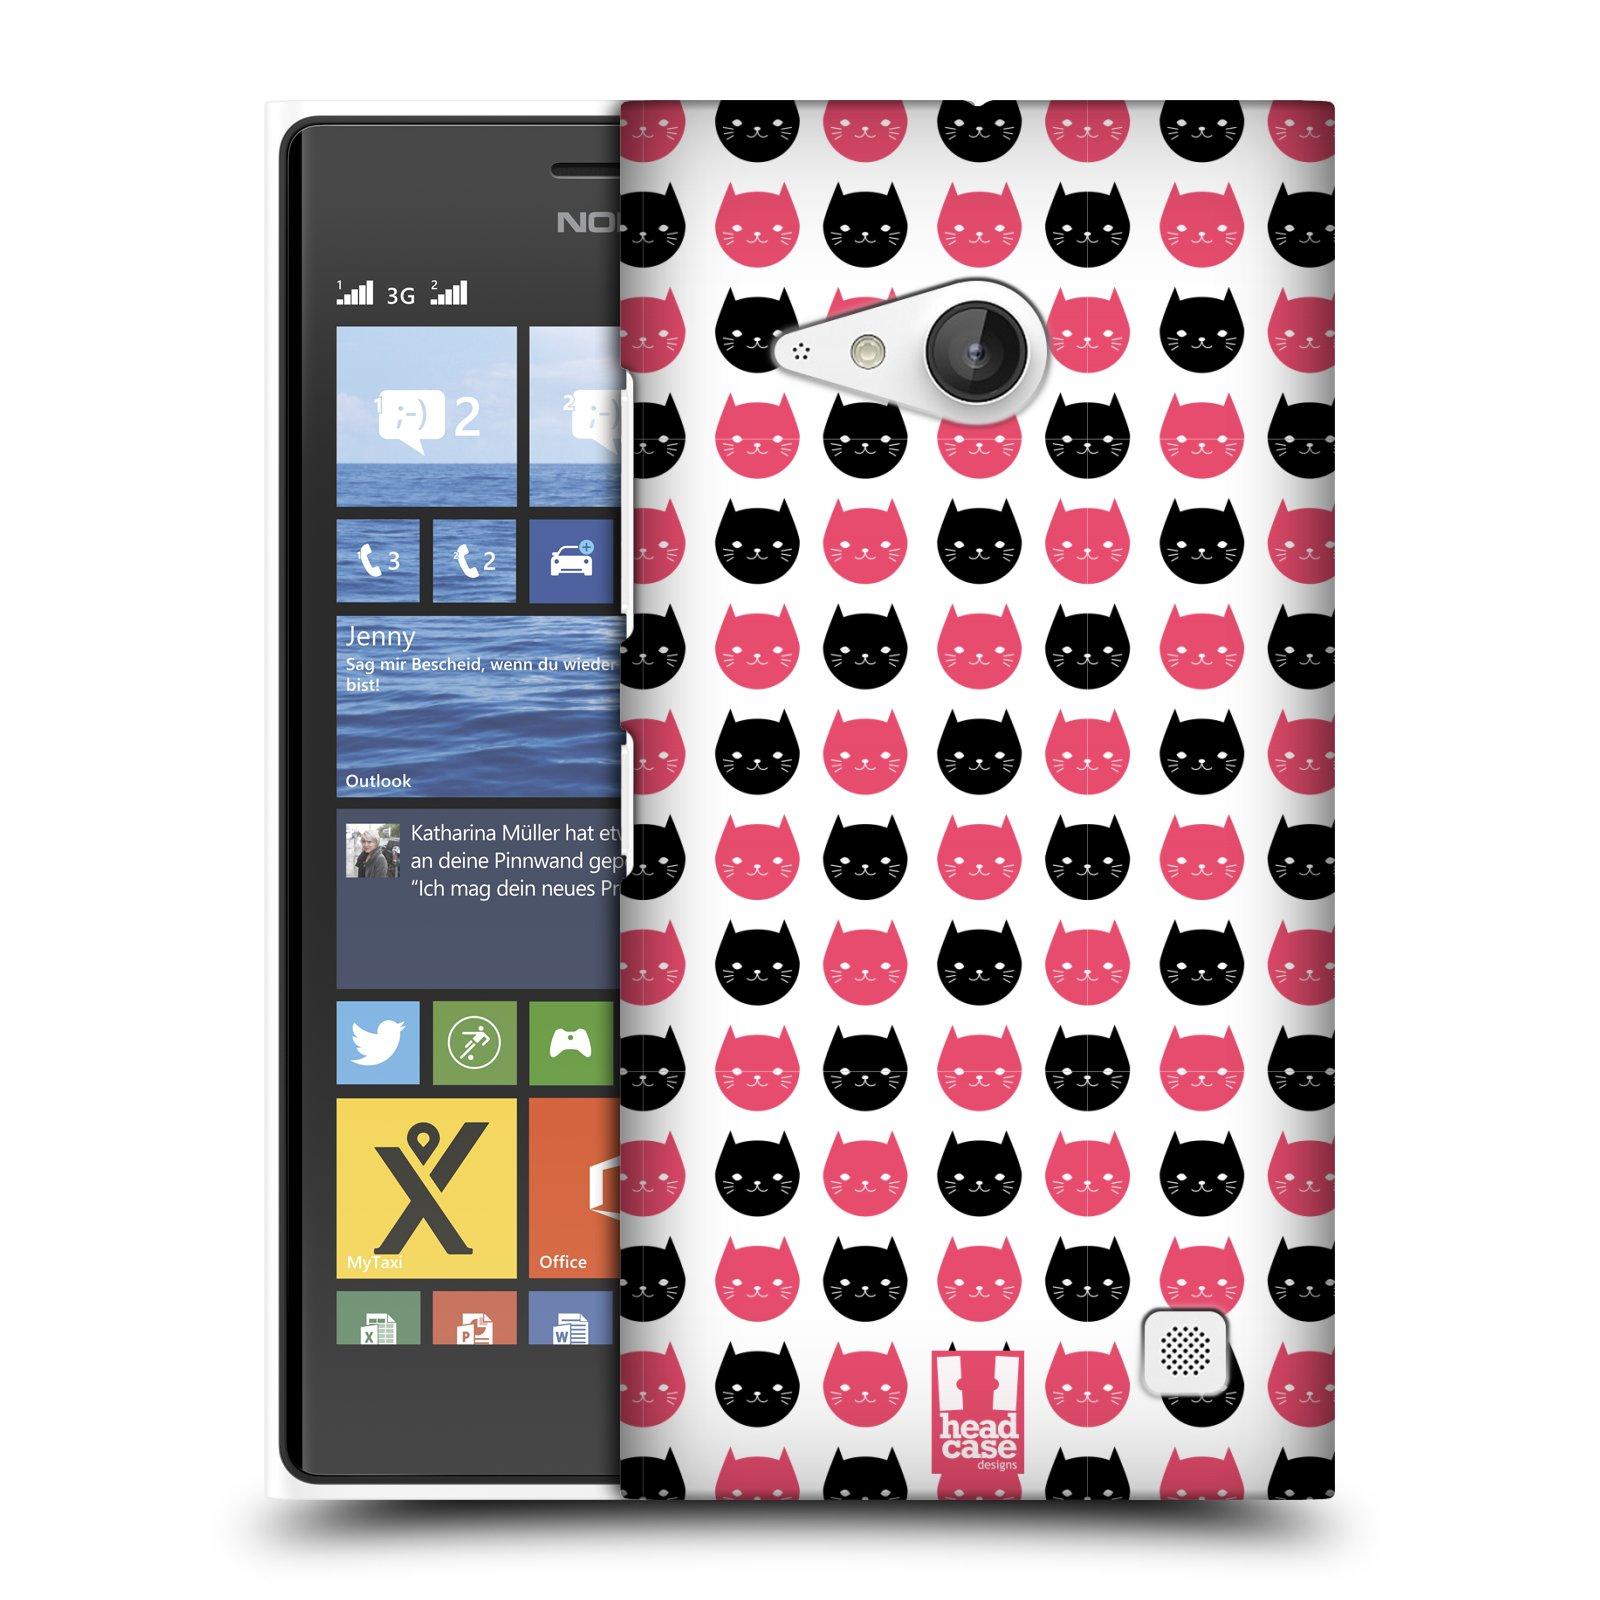 Plastové pouzdro na mobil Nokia Lumia 735 HEAD CASE KOČKY Black and Pink (Kryt či obal na mobilní telefon Nokia Lumia 735)